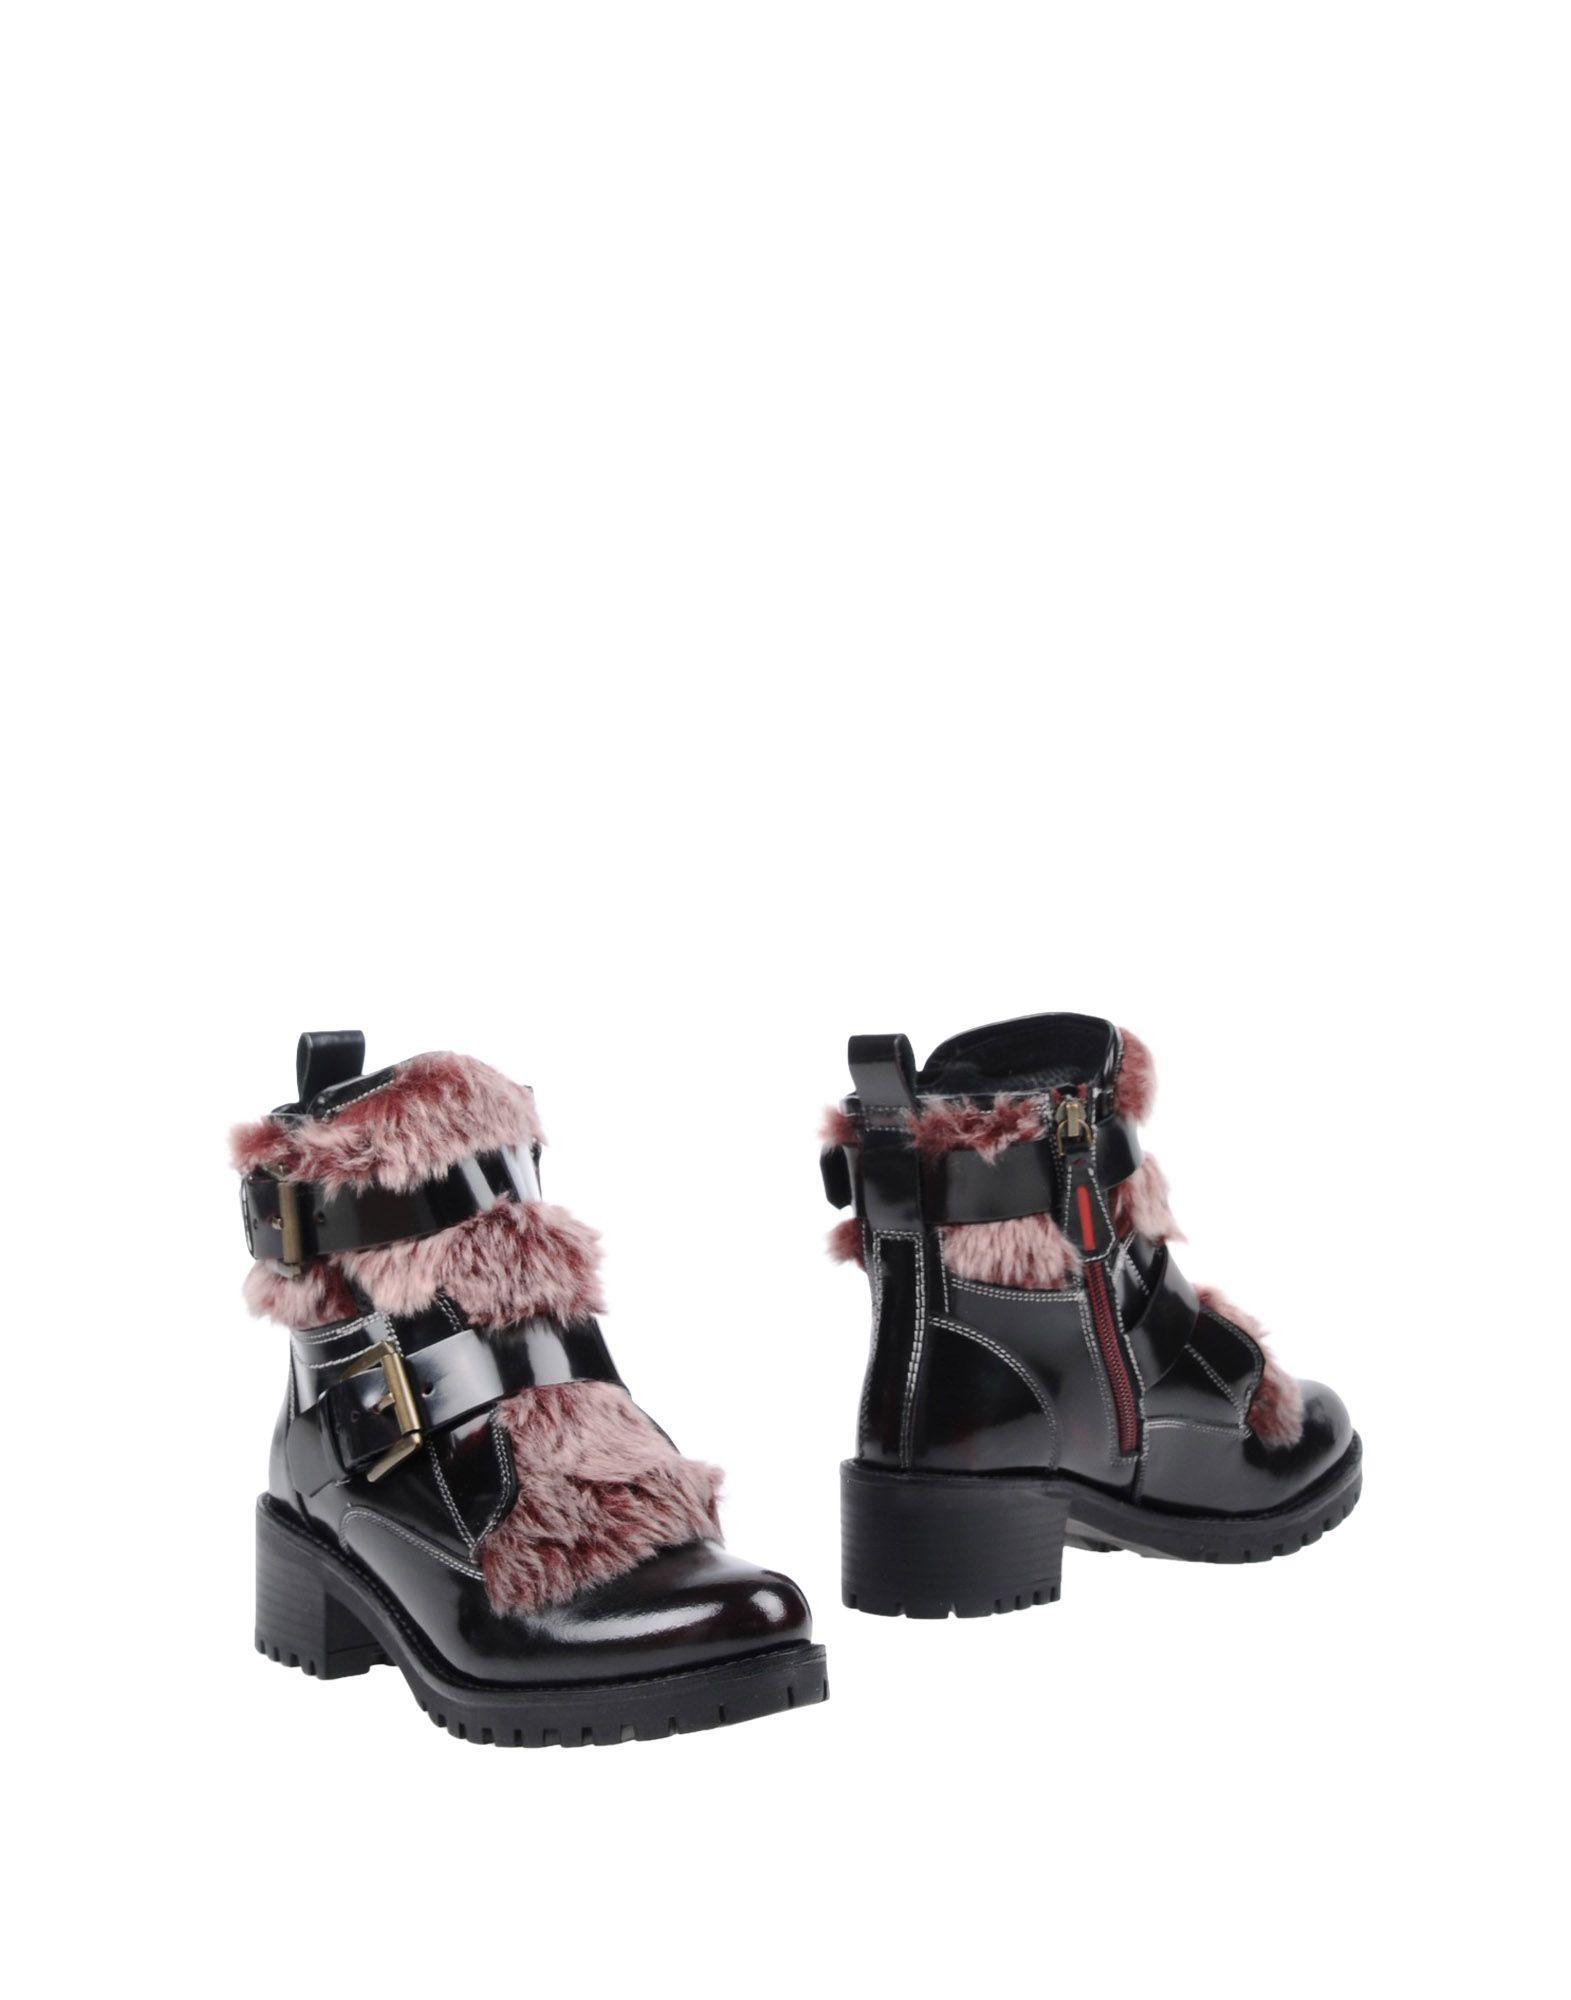 Gioseppo Stiefelette Damen  11461761XI Gute Qualität beliebte Schuhe Schuhe Schuhe df57ef